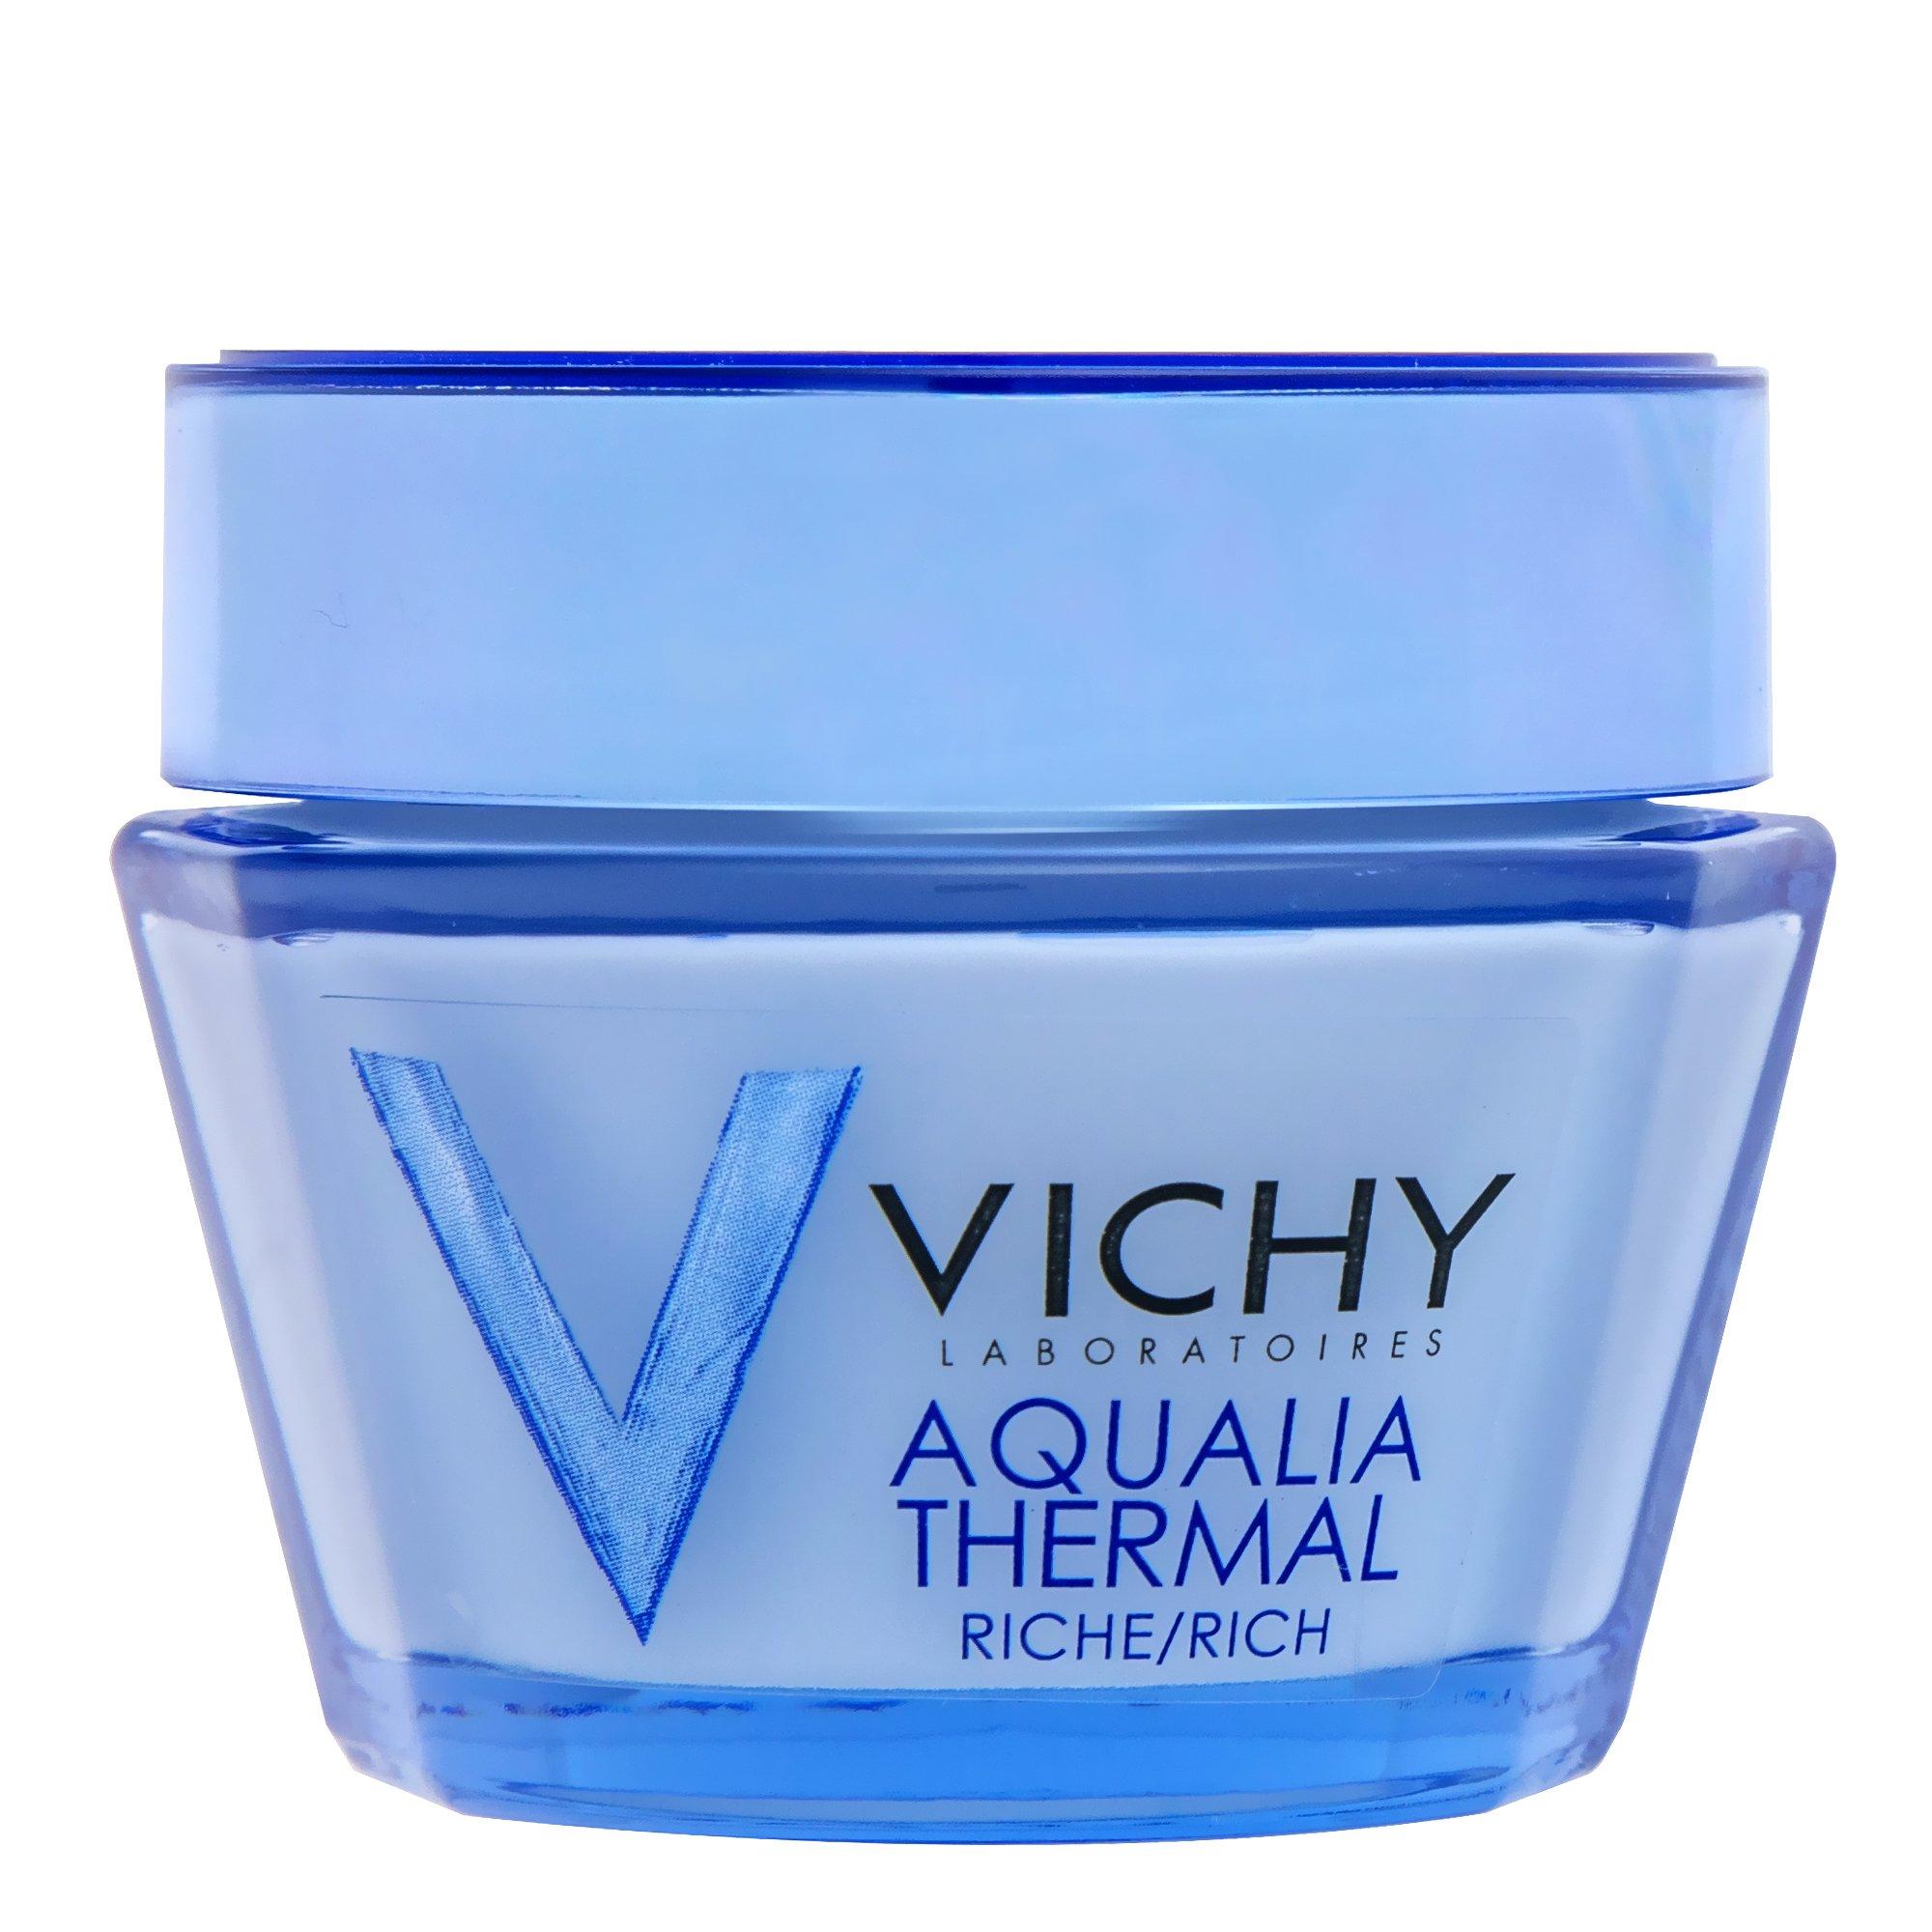 Vichy Aqualia Thermal Riche